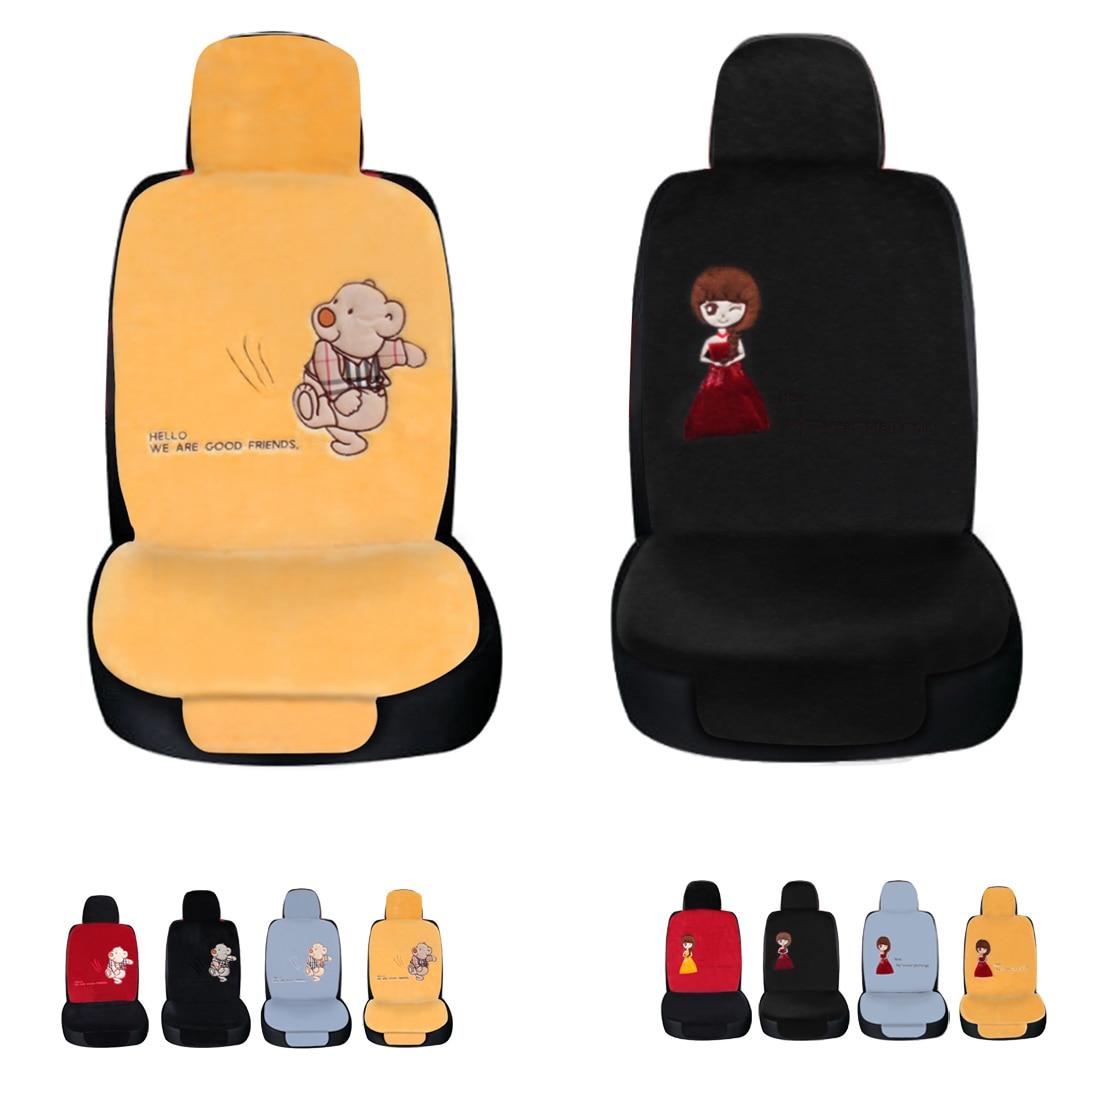 Dewtreetali Single Front Car Seat Cover Car Seat Cushion Bear Girl Winter Plush Cushion Car Seat Covers for Auto Van Truck anne klein new purple merlot women s 14 straight leg career dress pants $99 087